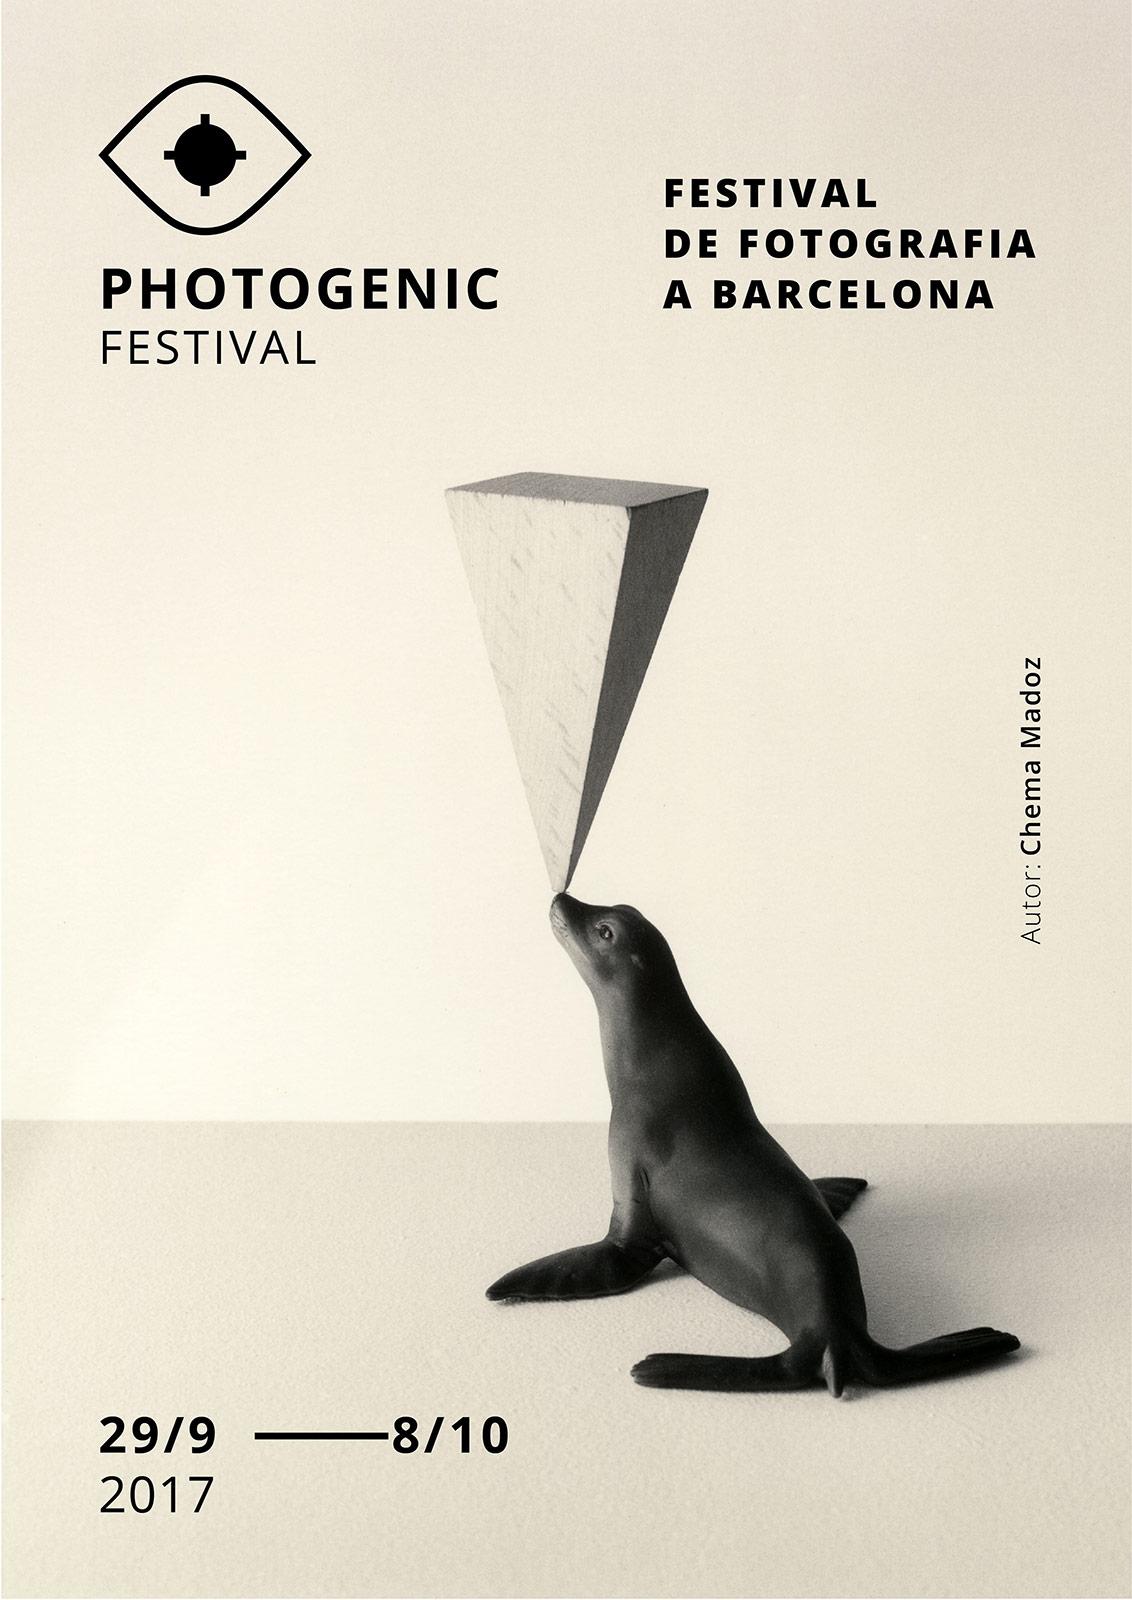 Photogenic festival 2017